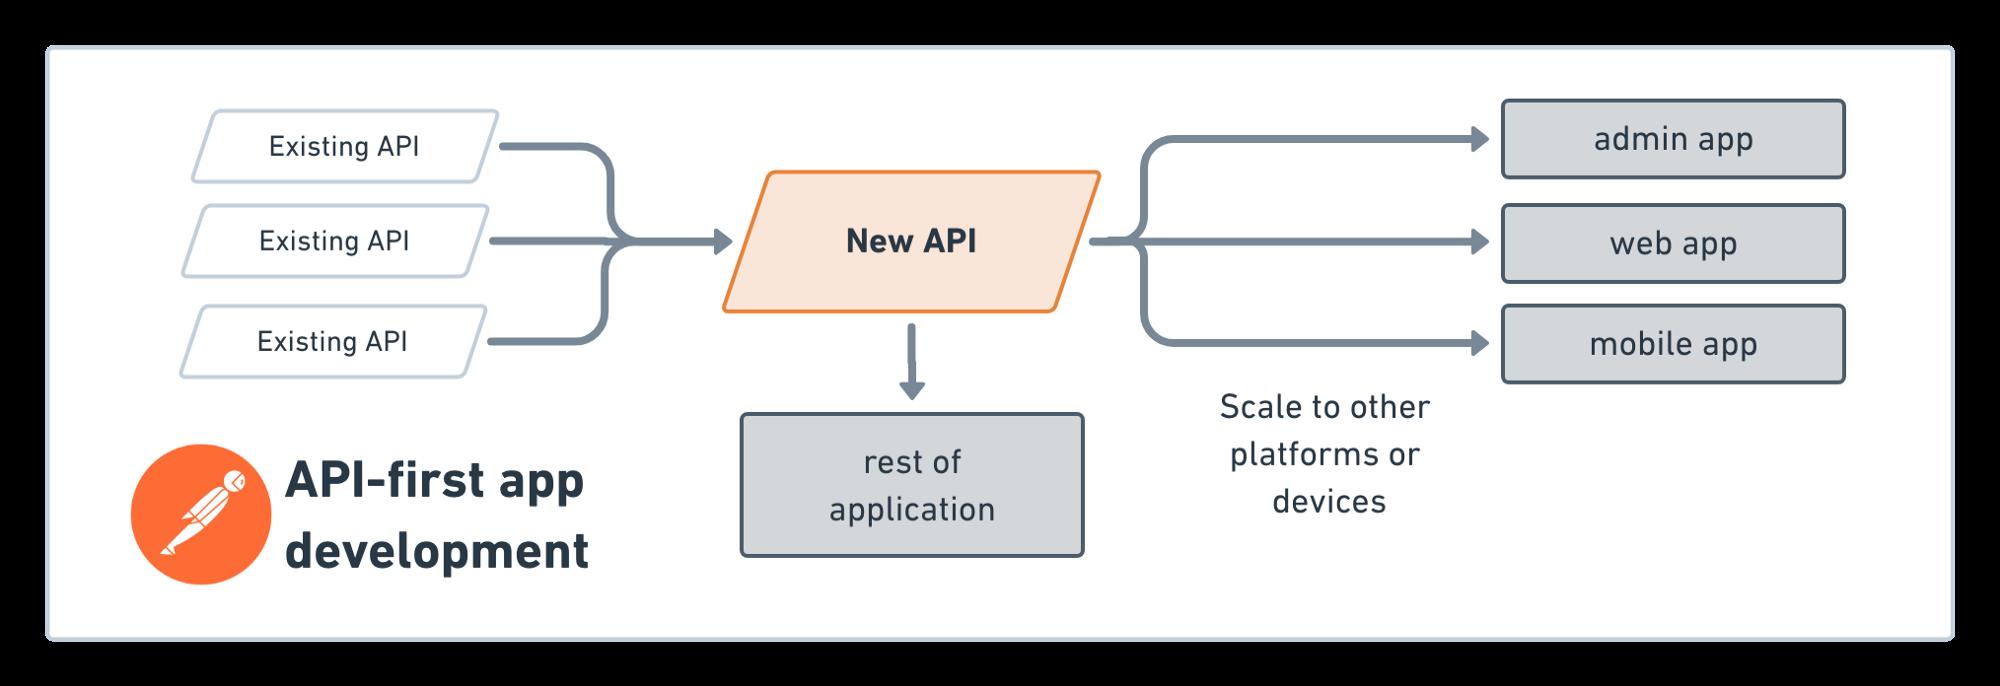 Focus on API development